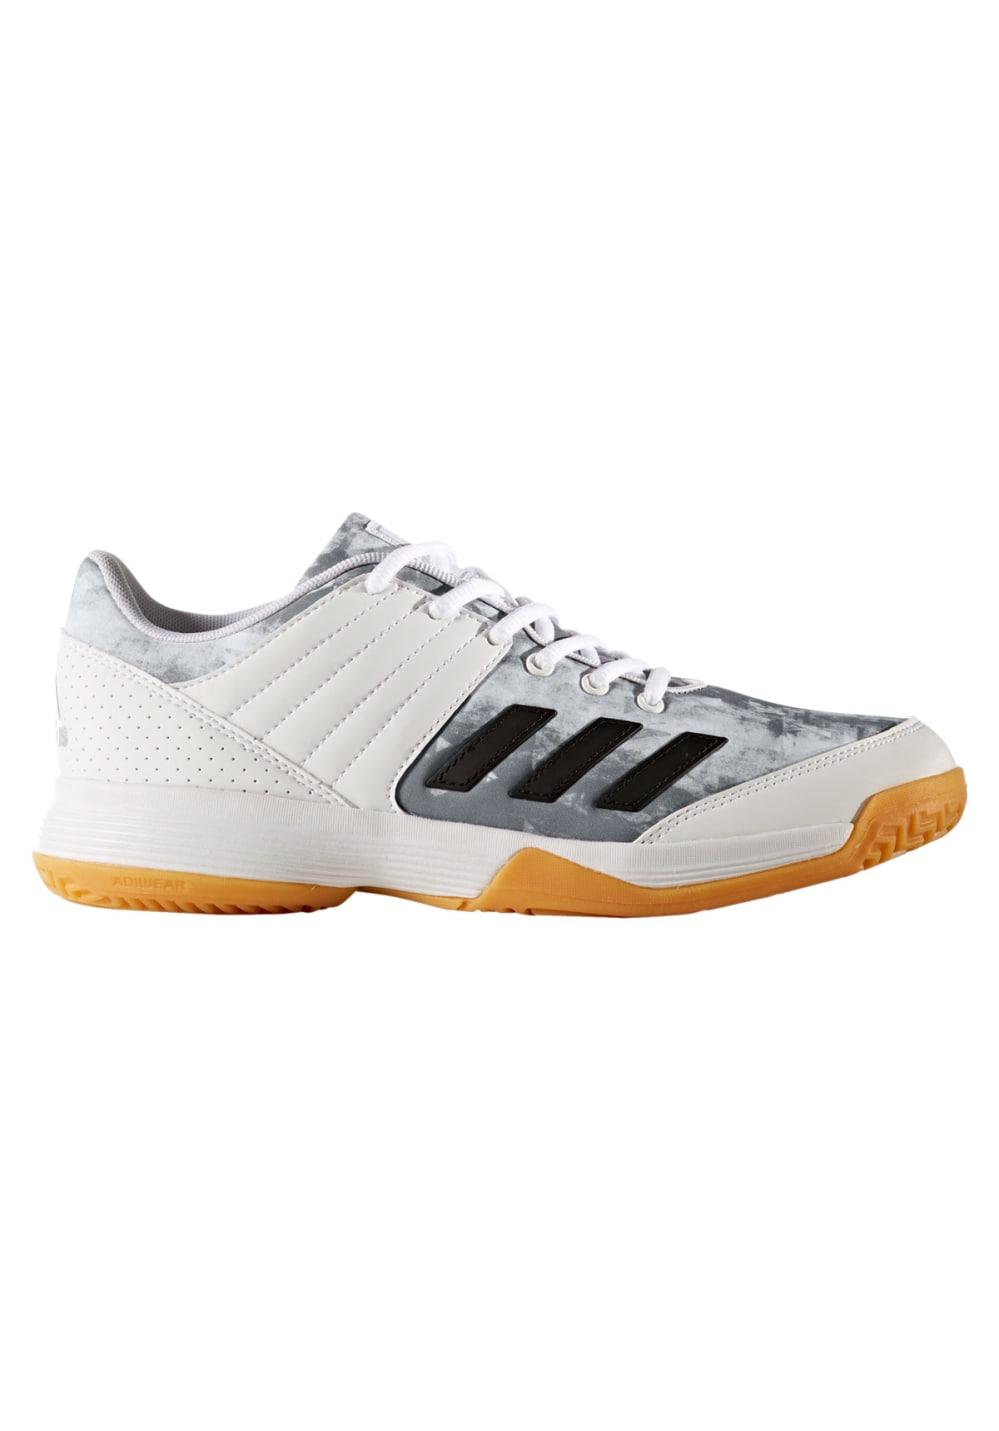 chaussures femme adidas ligra 5